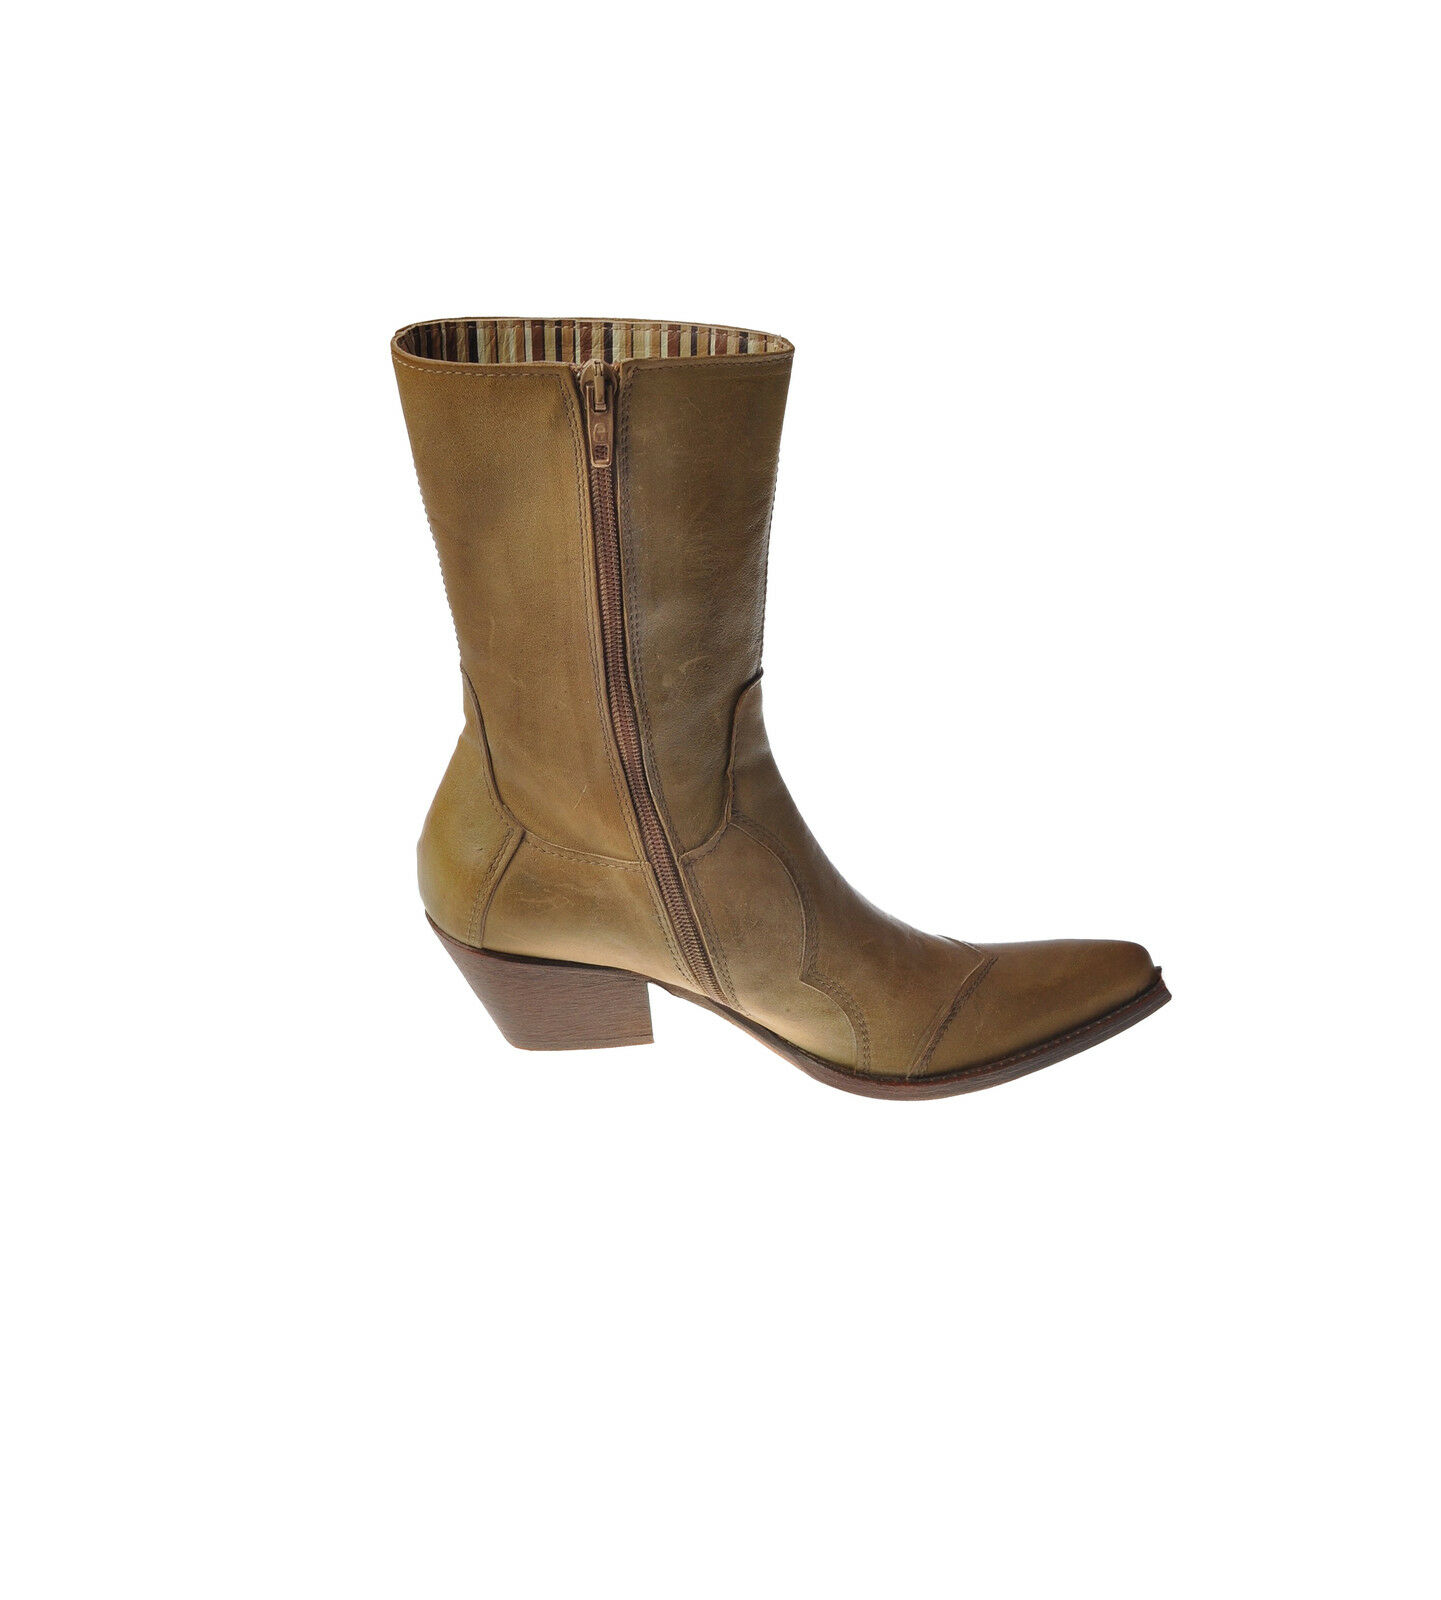 MoMA-Zapatos-botas-Mujer - verde verde verde - 3252328N185053  ventas en linea